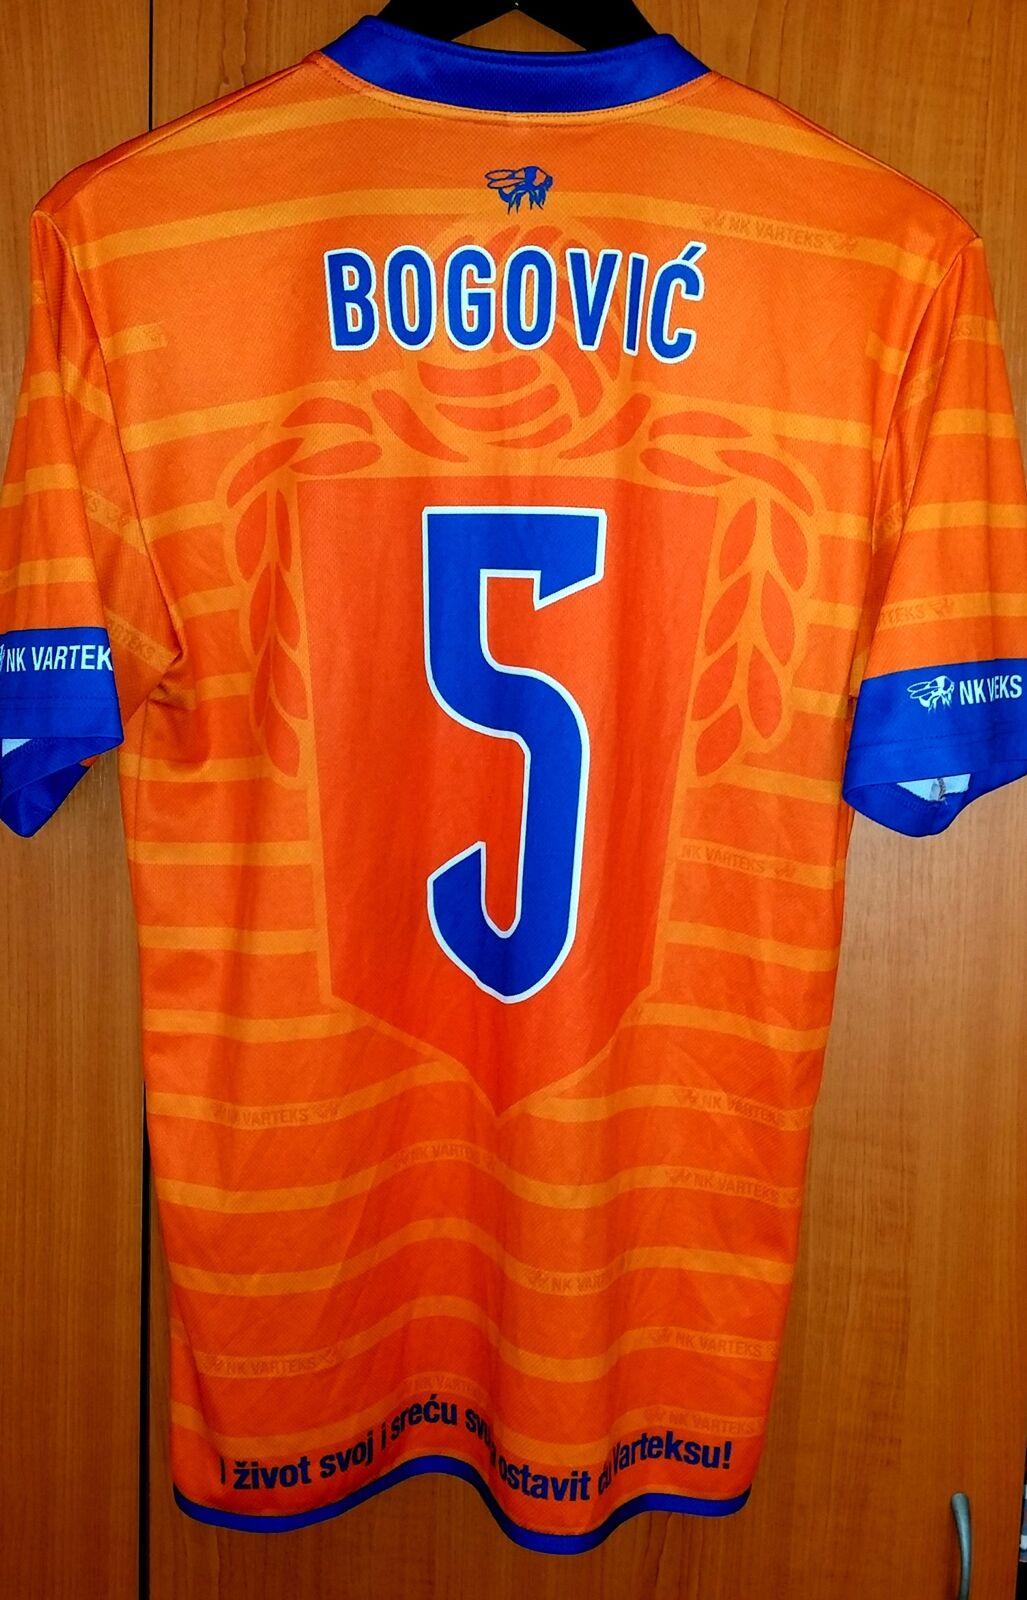 Trikot Fußball Varteks NK Varteks Fußball Varazdin Marko Bogovic 2016 fotex  M Orange daca3b